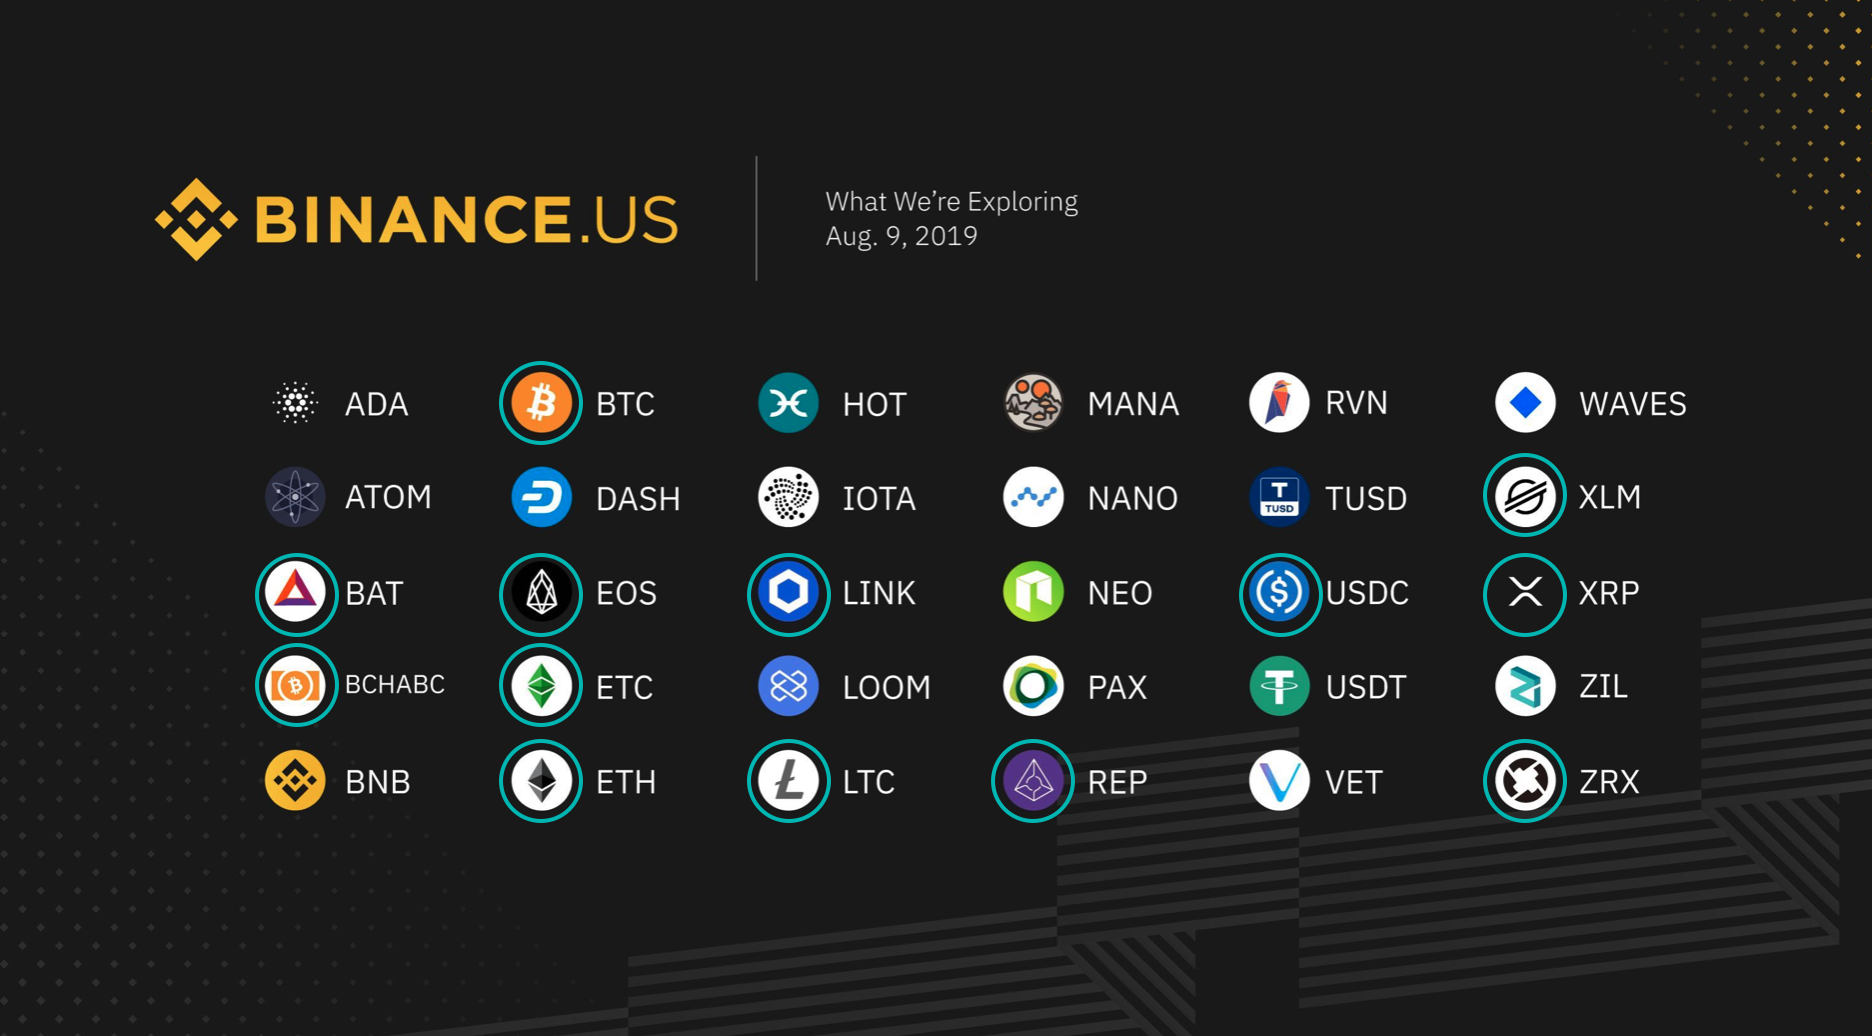 binance list of cryptocurrencies